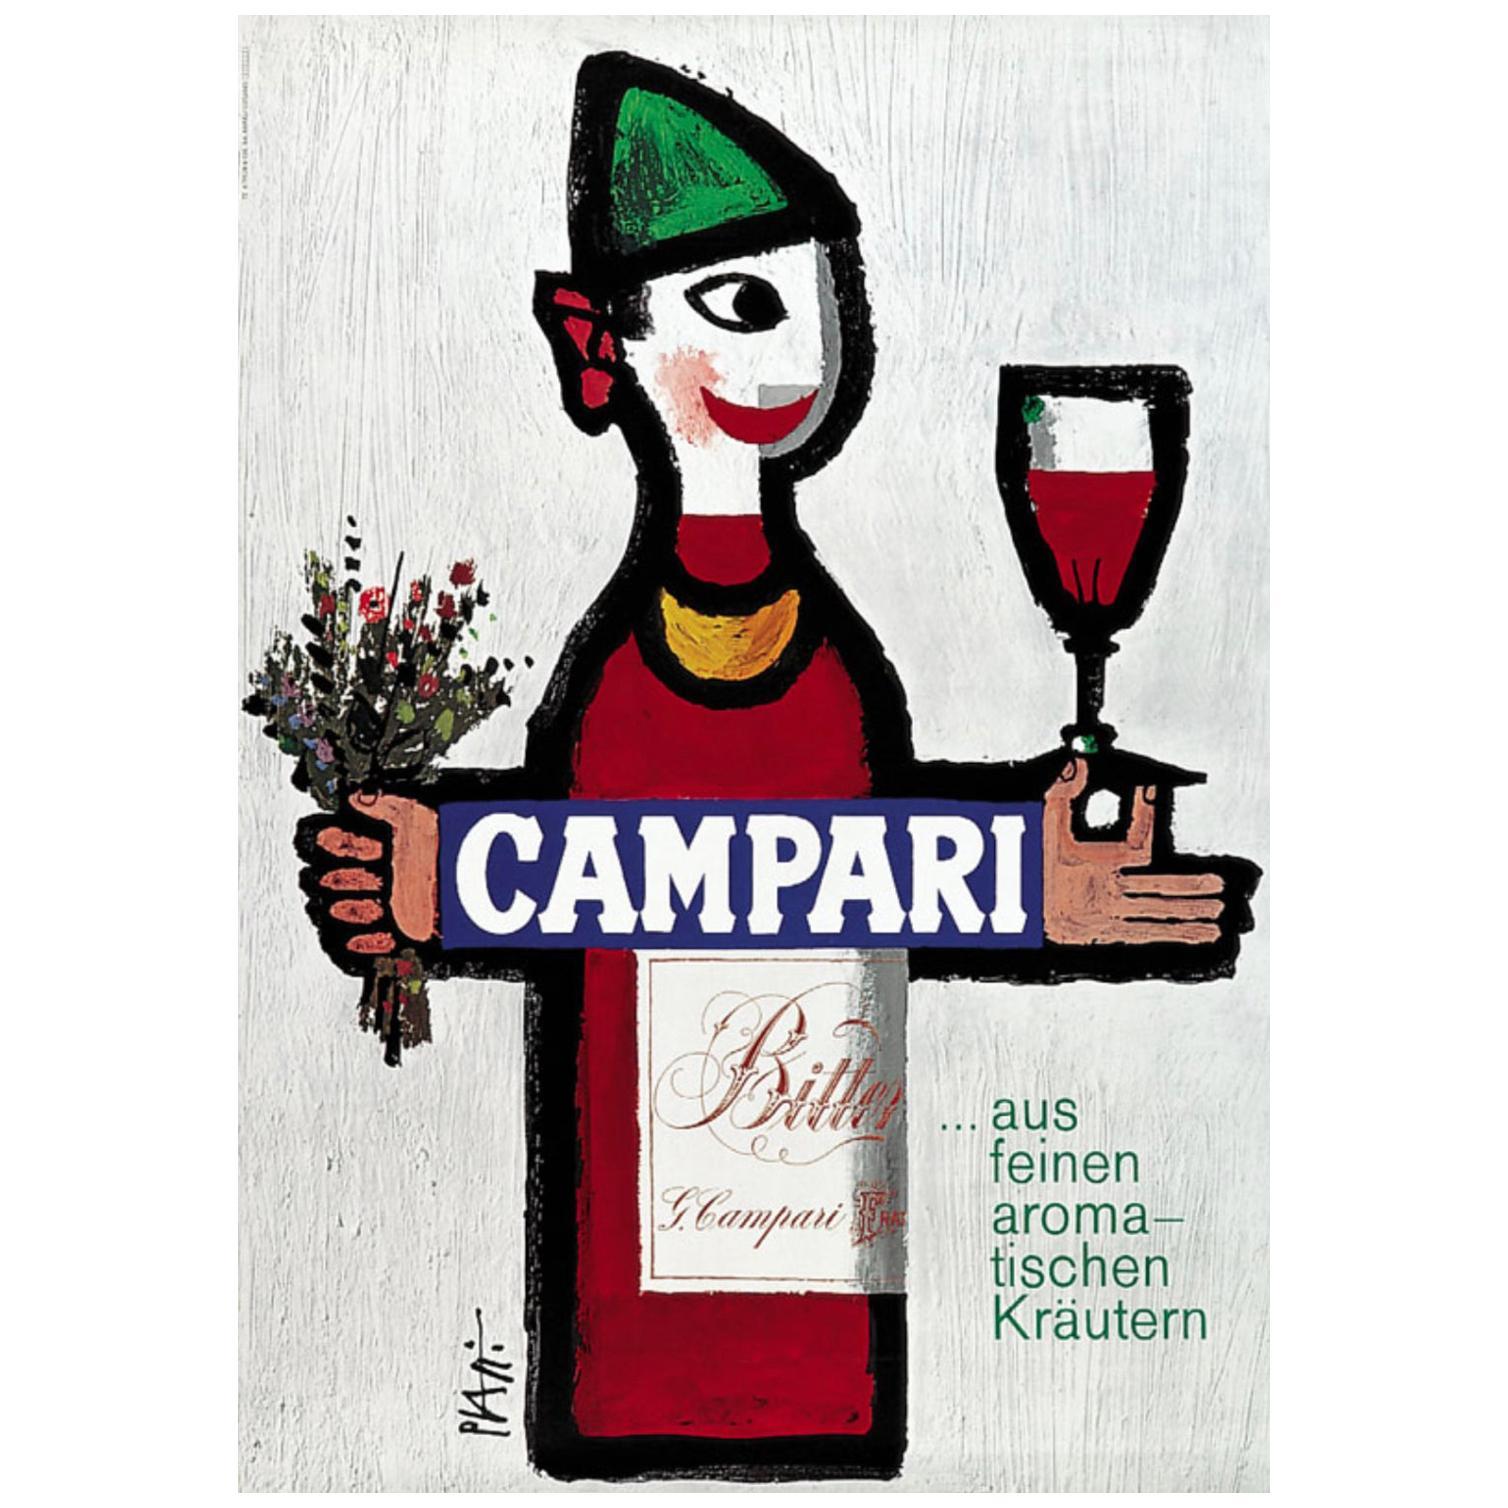 Original Vintage 1960's Advertising Poster, 'CAMPARI' by Piatti